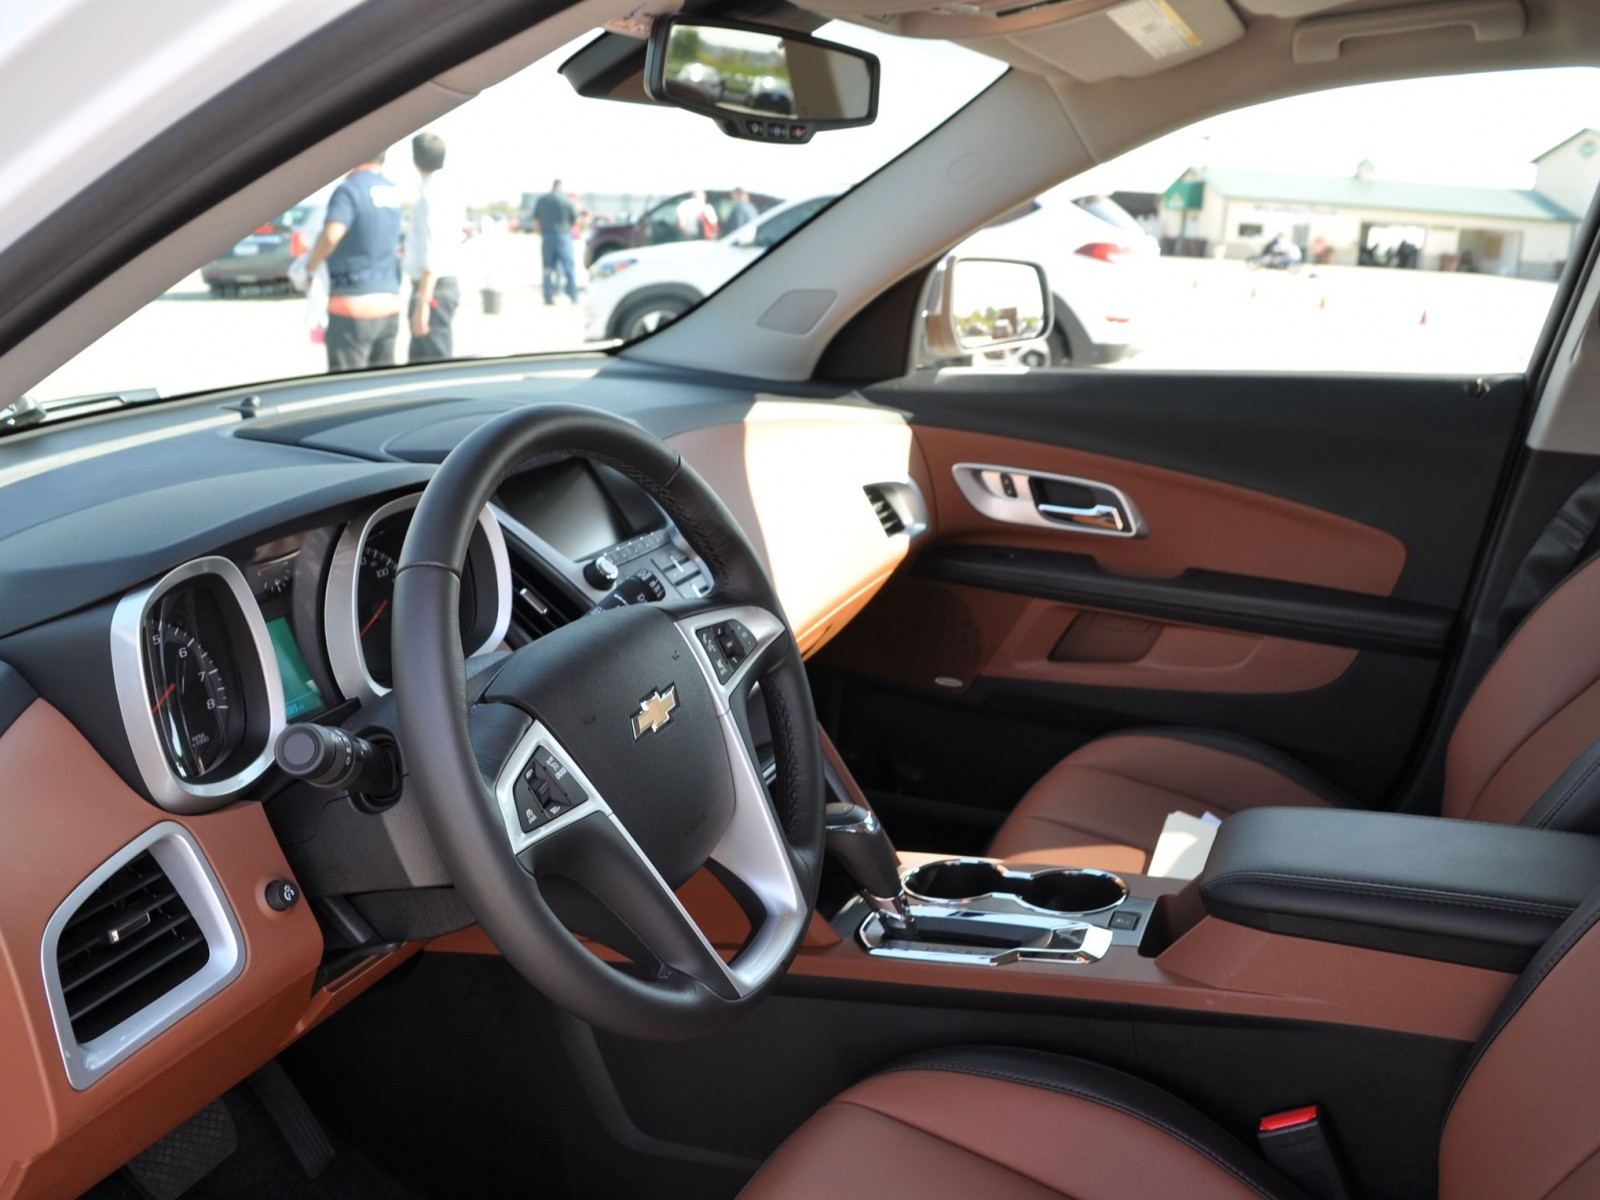 2016 Chevrolet Equinox Ltz Interior Saddle Brown 2